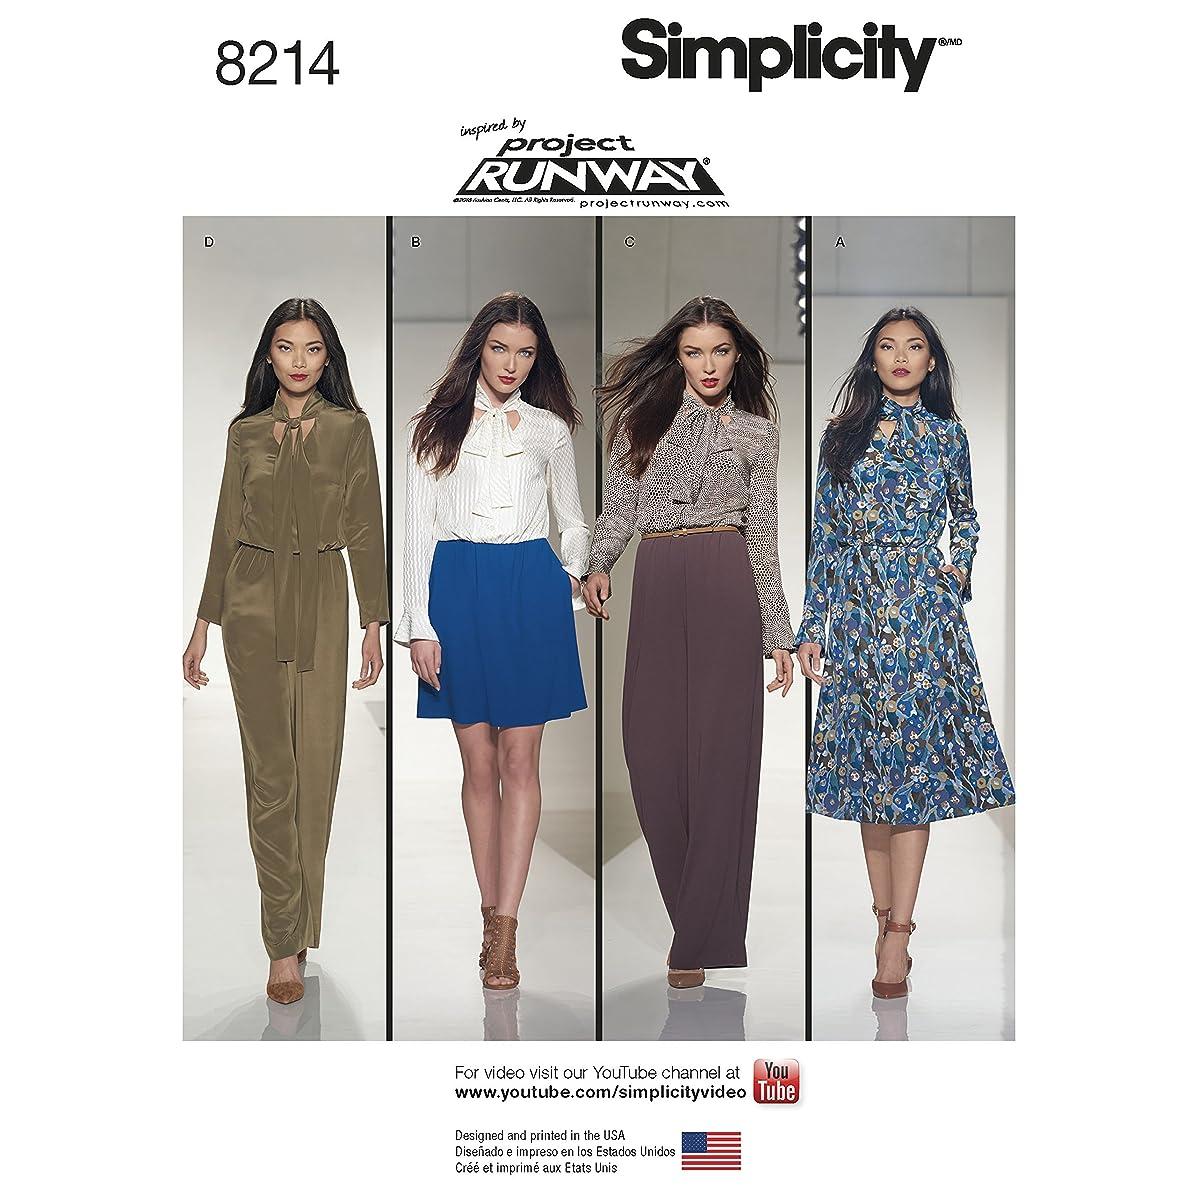 Simplicity Patterns 8214 Misses' Dresses and Jumpsuits, Size: R5 (14-16-18-20-22)